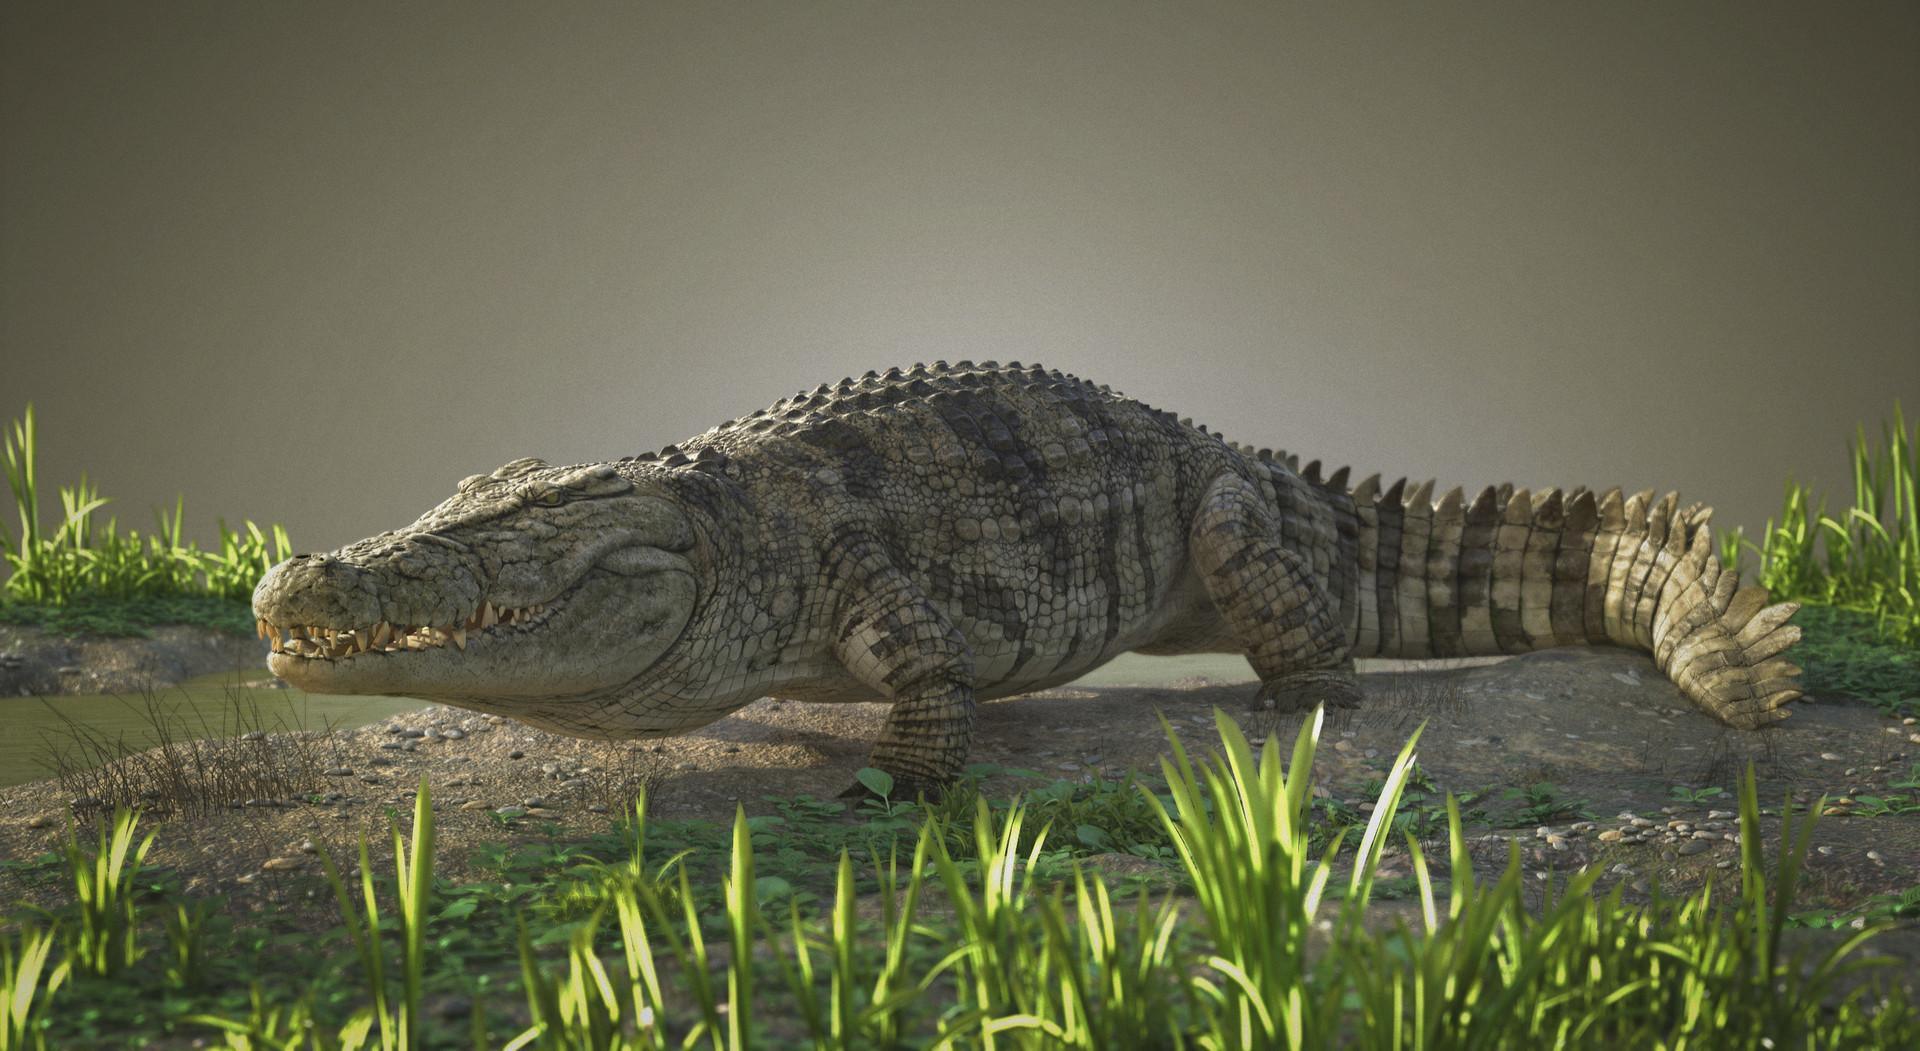 ArtStation - Wild and angry Crocodile, Dmytro Teslenko